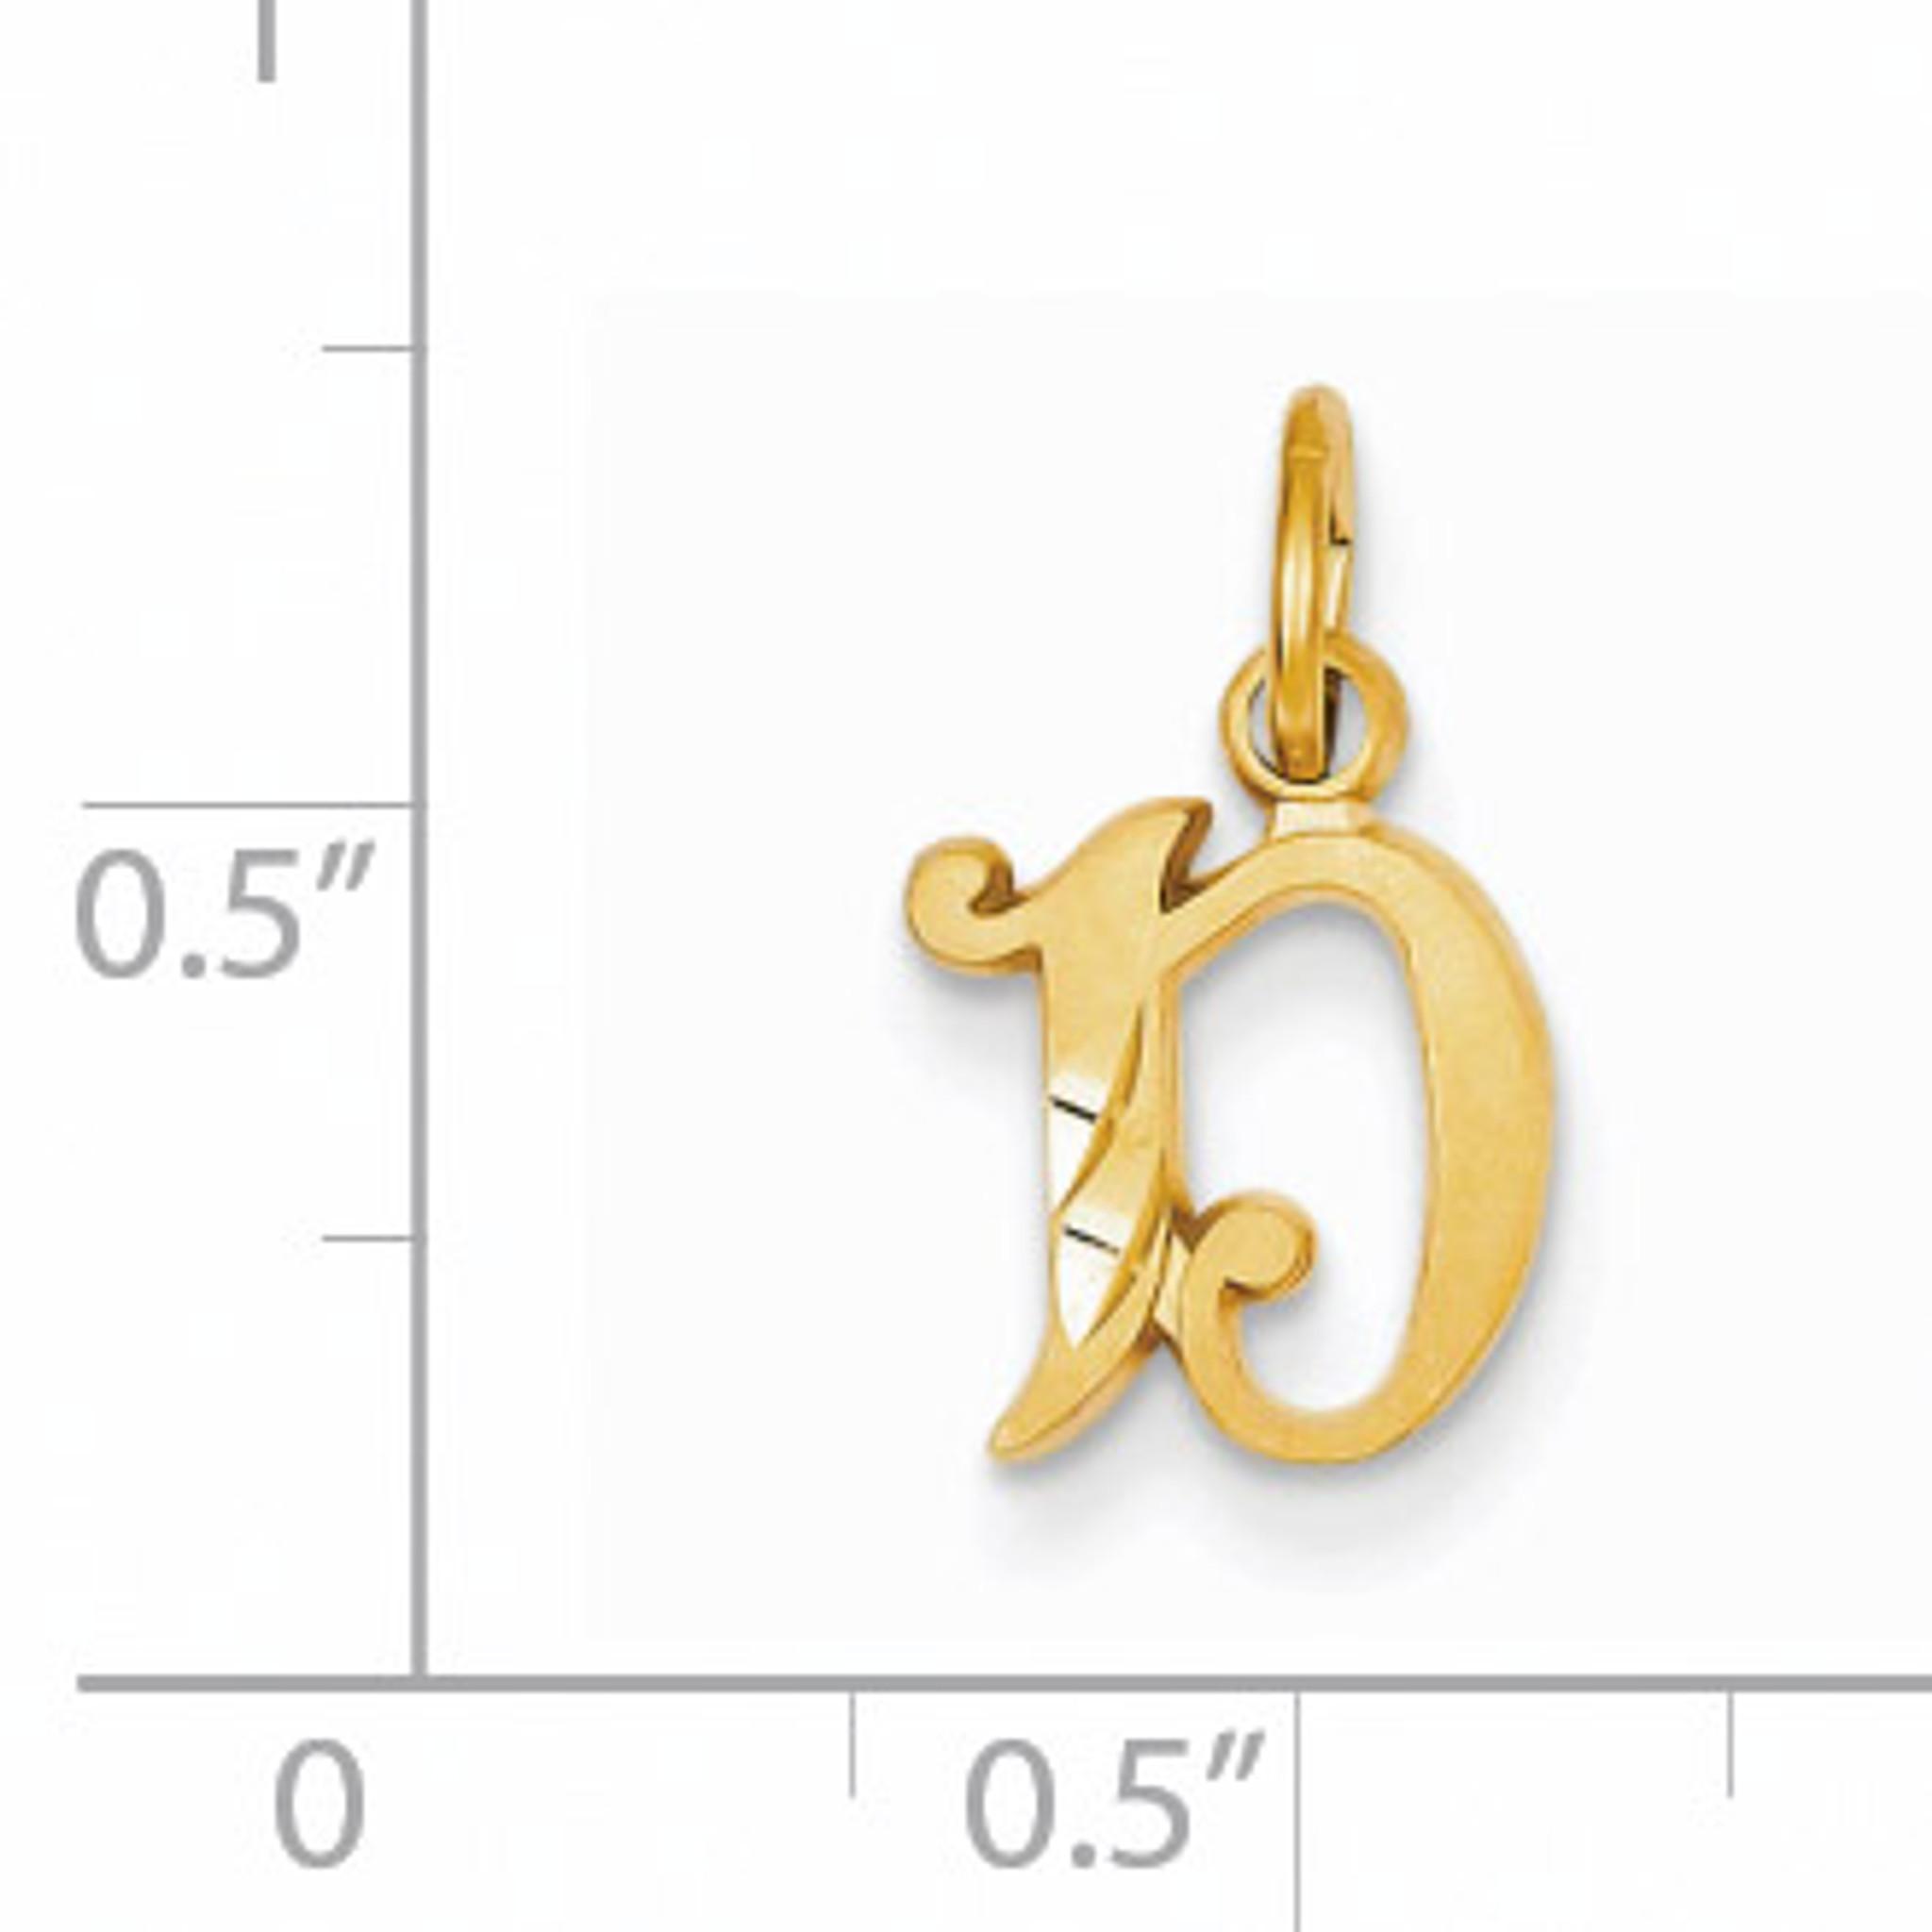 Saamarth Impex Malachite /& Rutile Quartz 925 Silver Plated Dangle Earring PG-130741